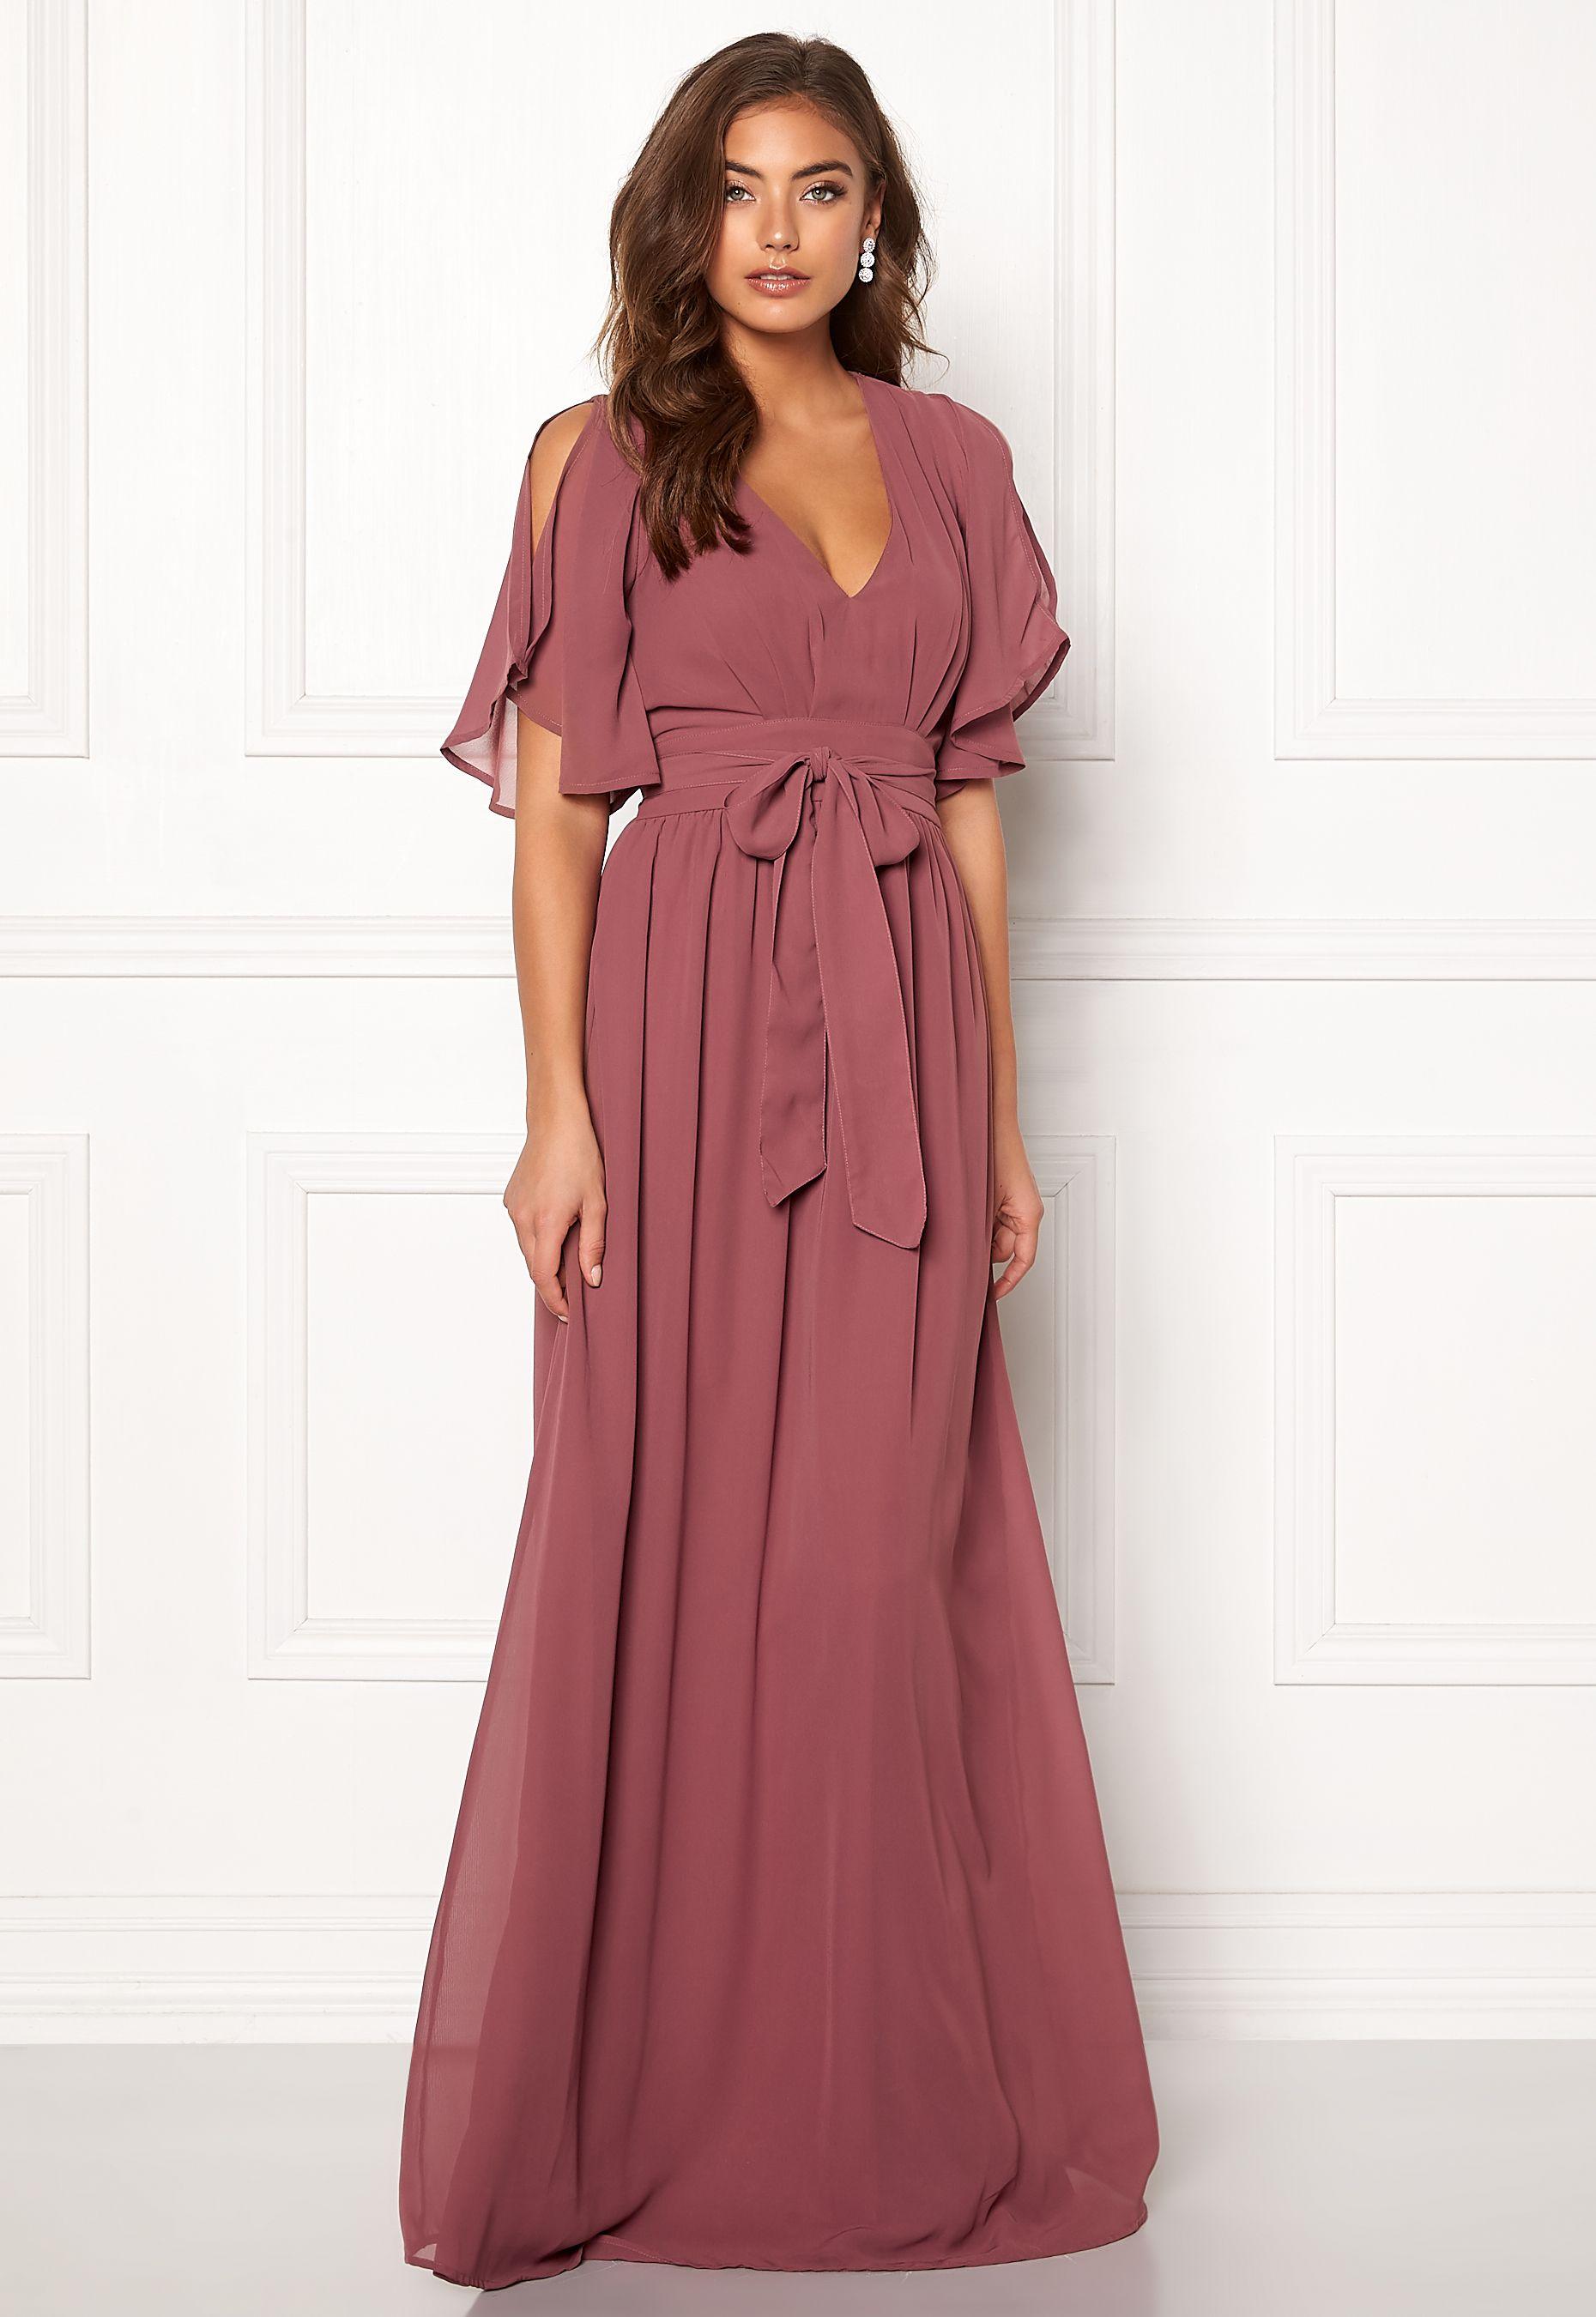 2e8e0fabc5f7 Make Way Isobel dress